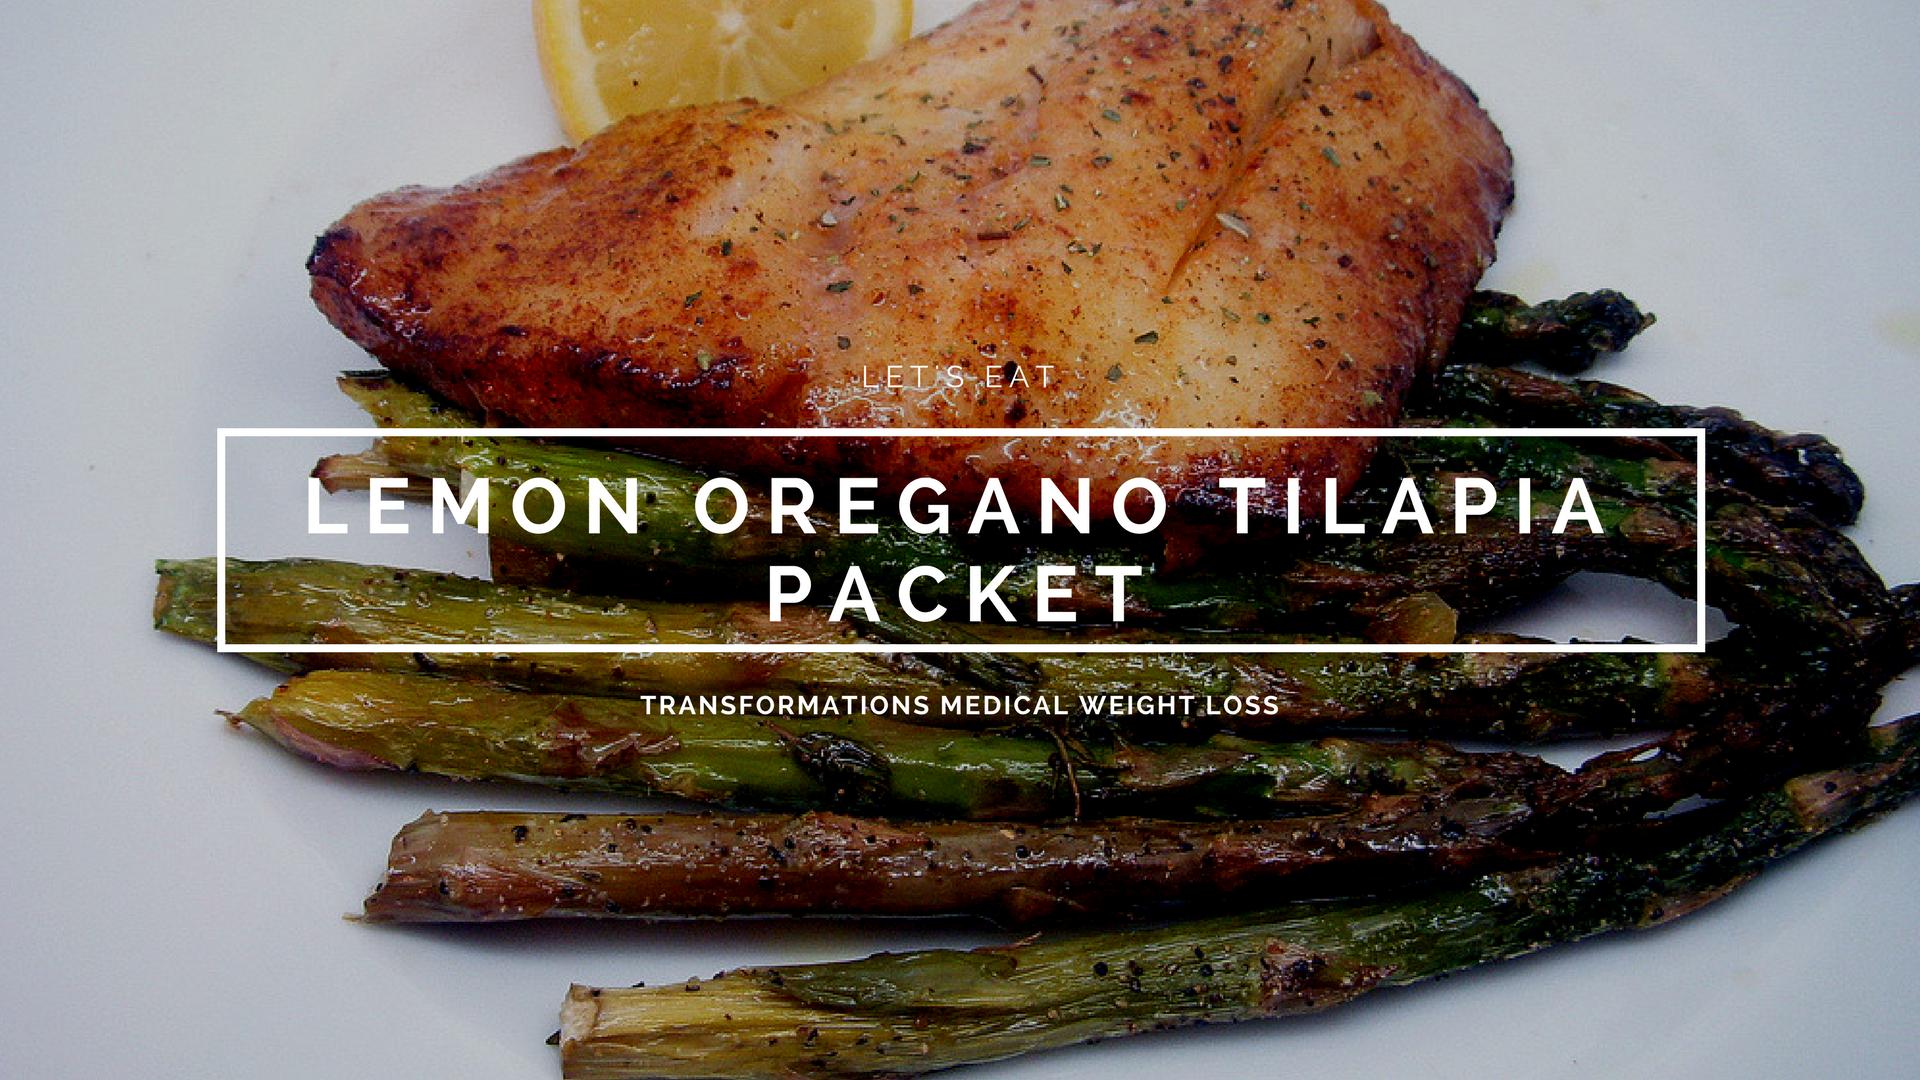 Lemon Oregano Tilapia Packet